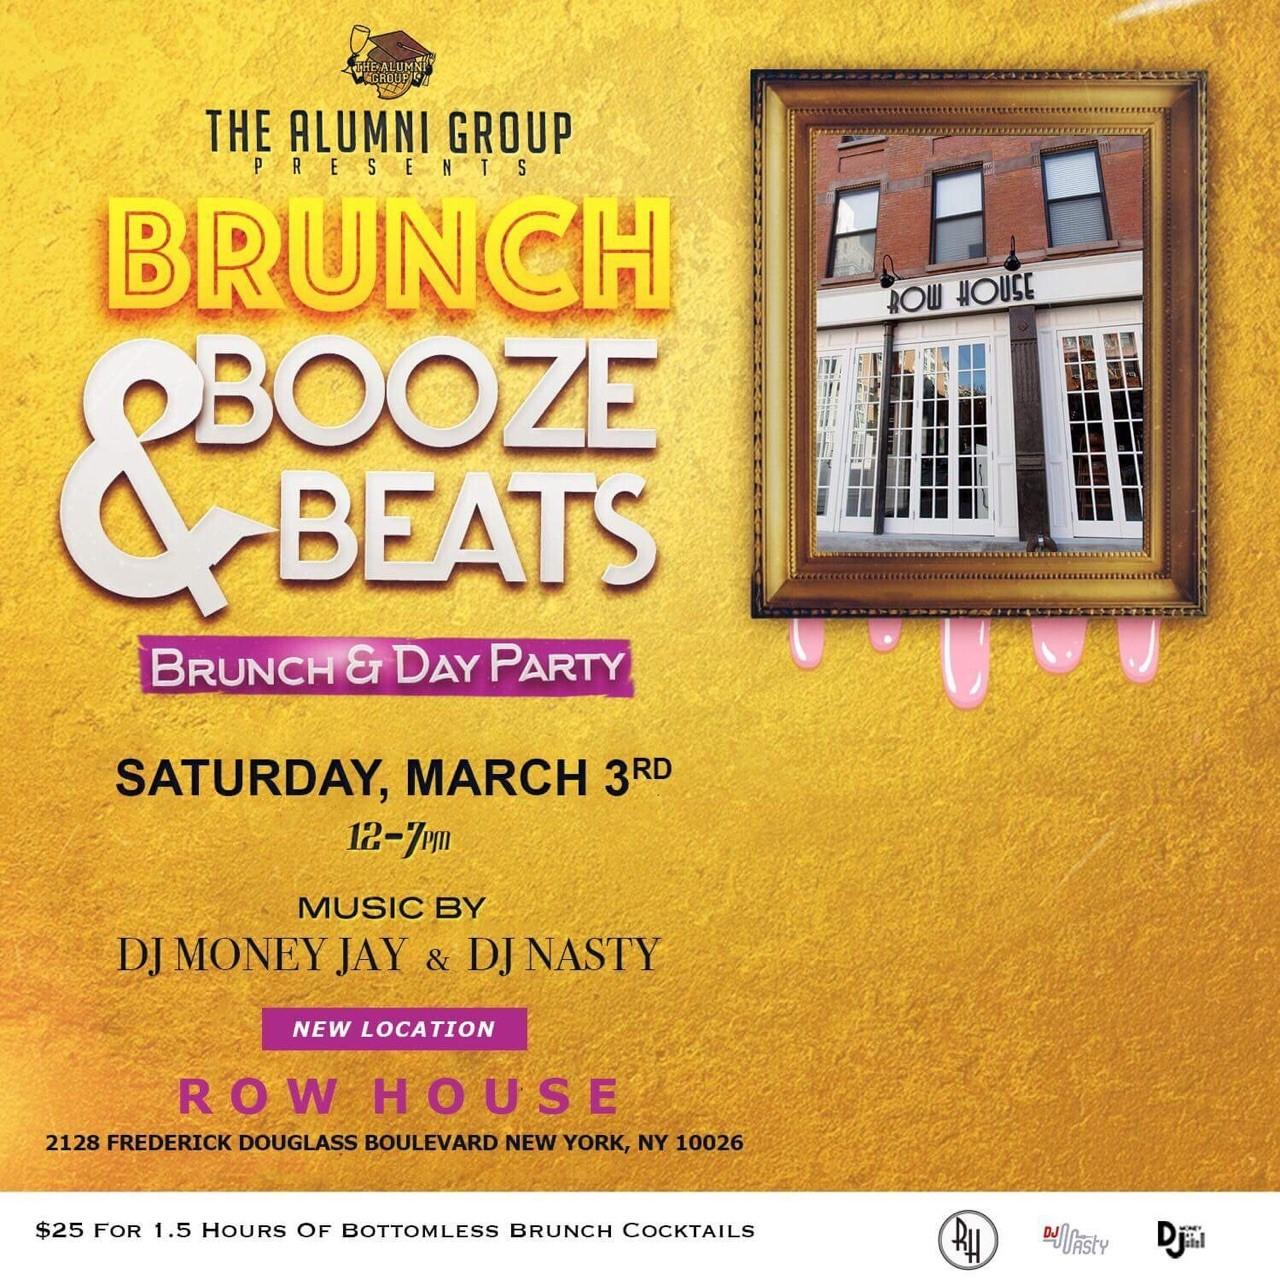 Brunch, Booze, & Beats: Brunch & Day Party